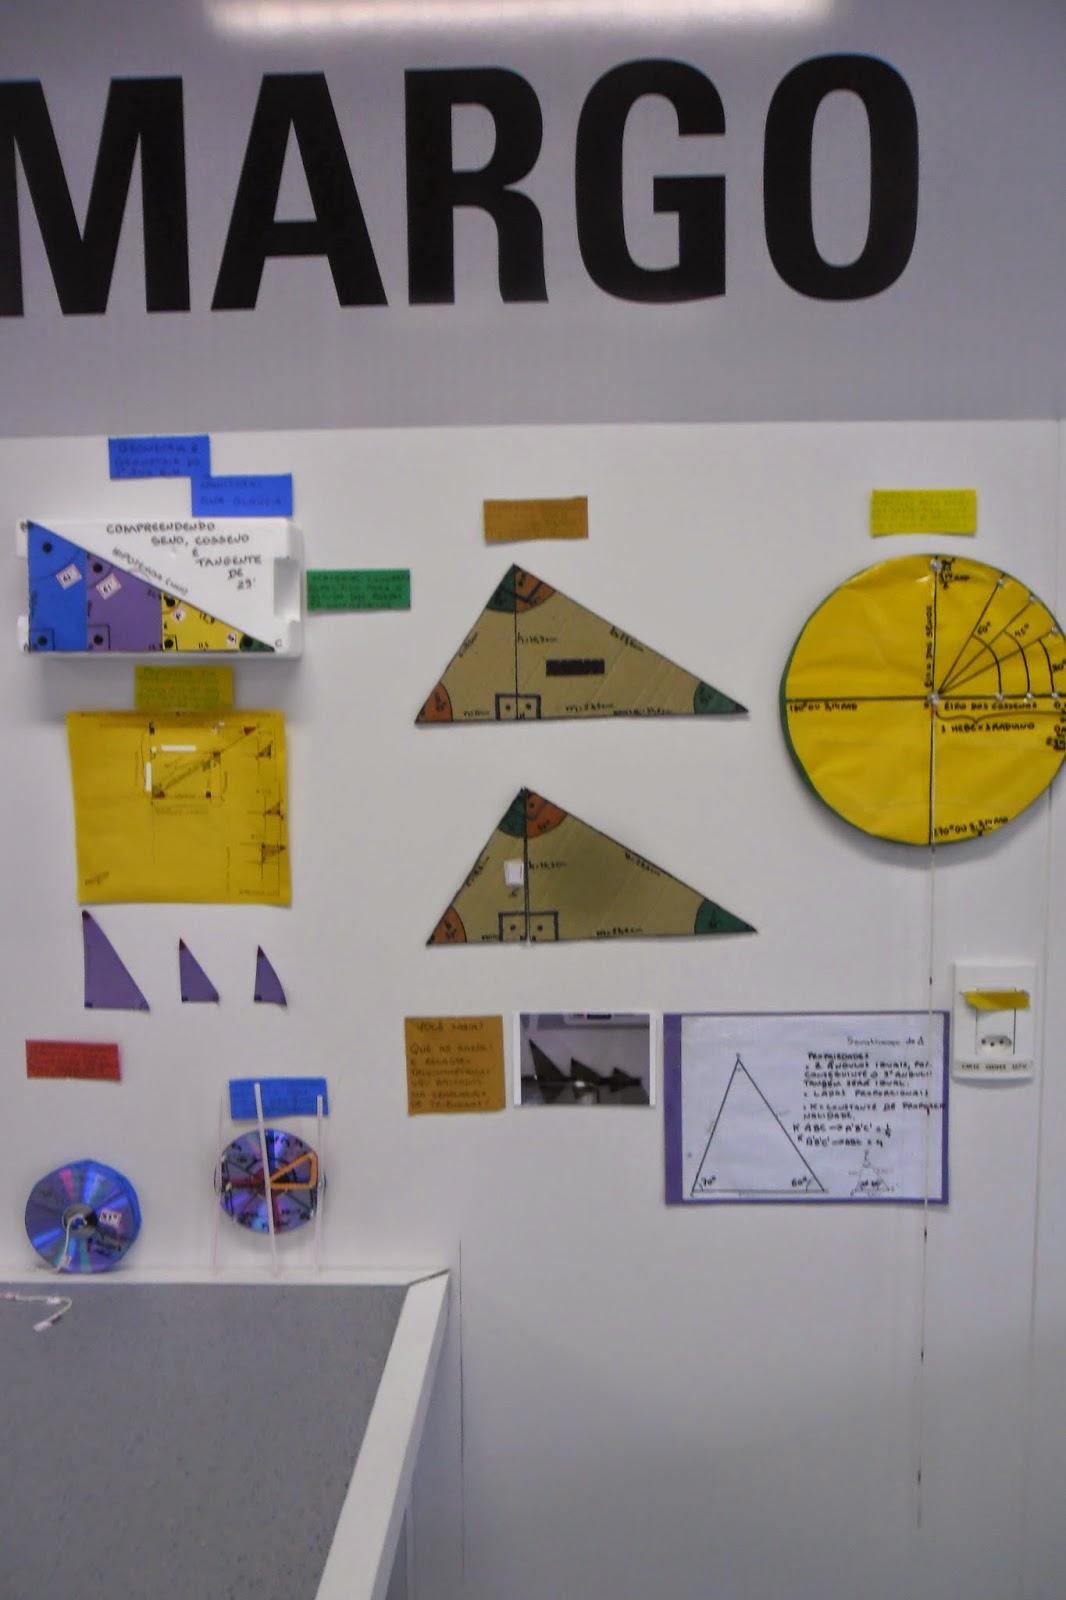 Estação 2: Geometria-Álgebra-Aritmética II (Ênfase em Geometria do Ensino Médio)